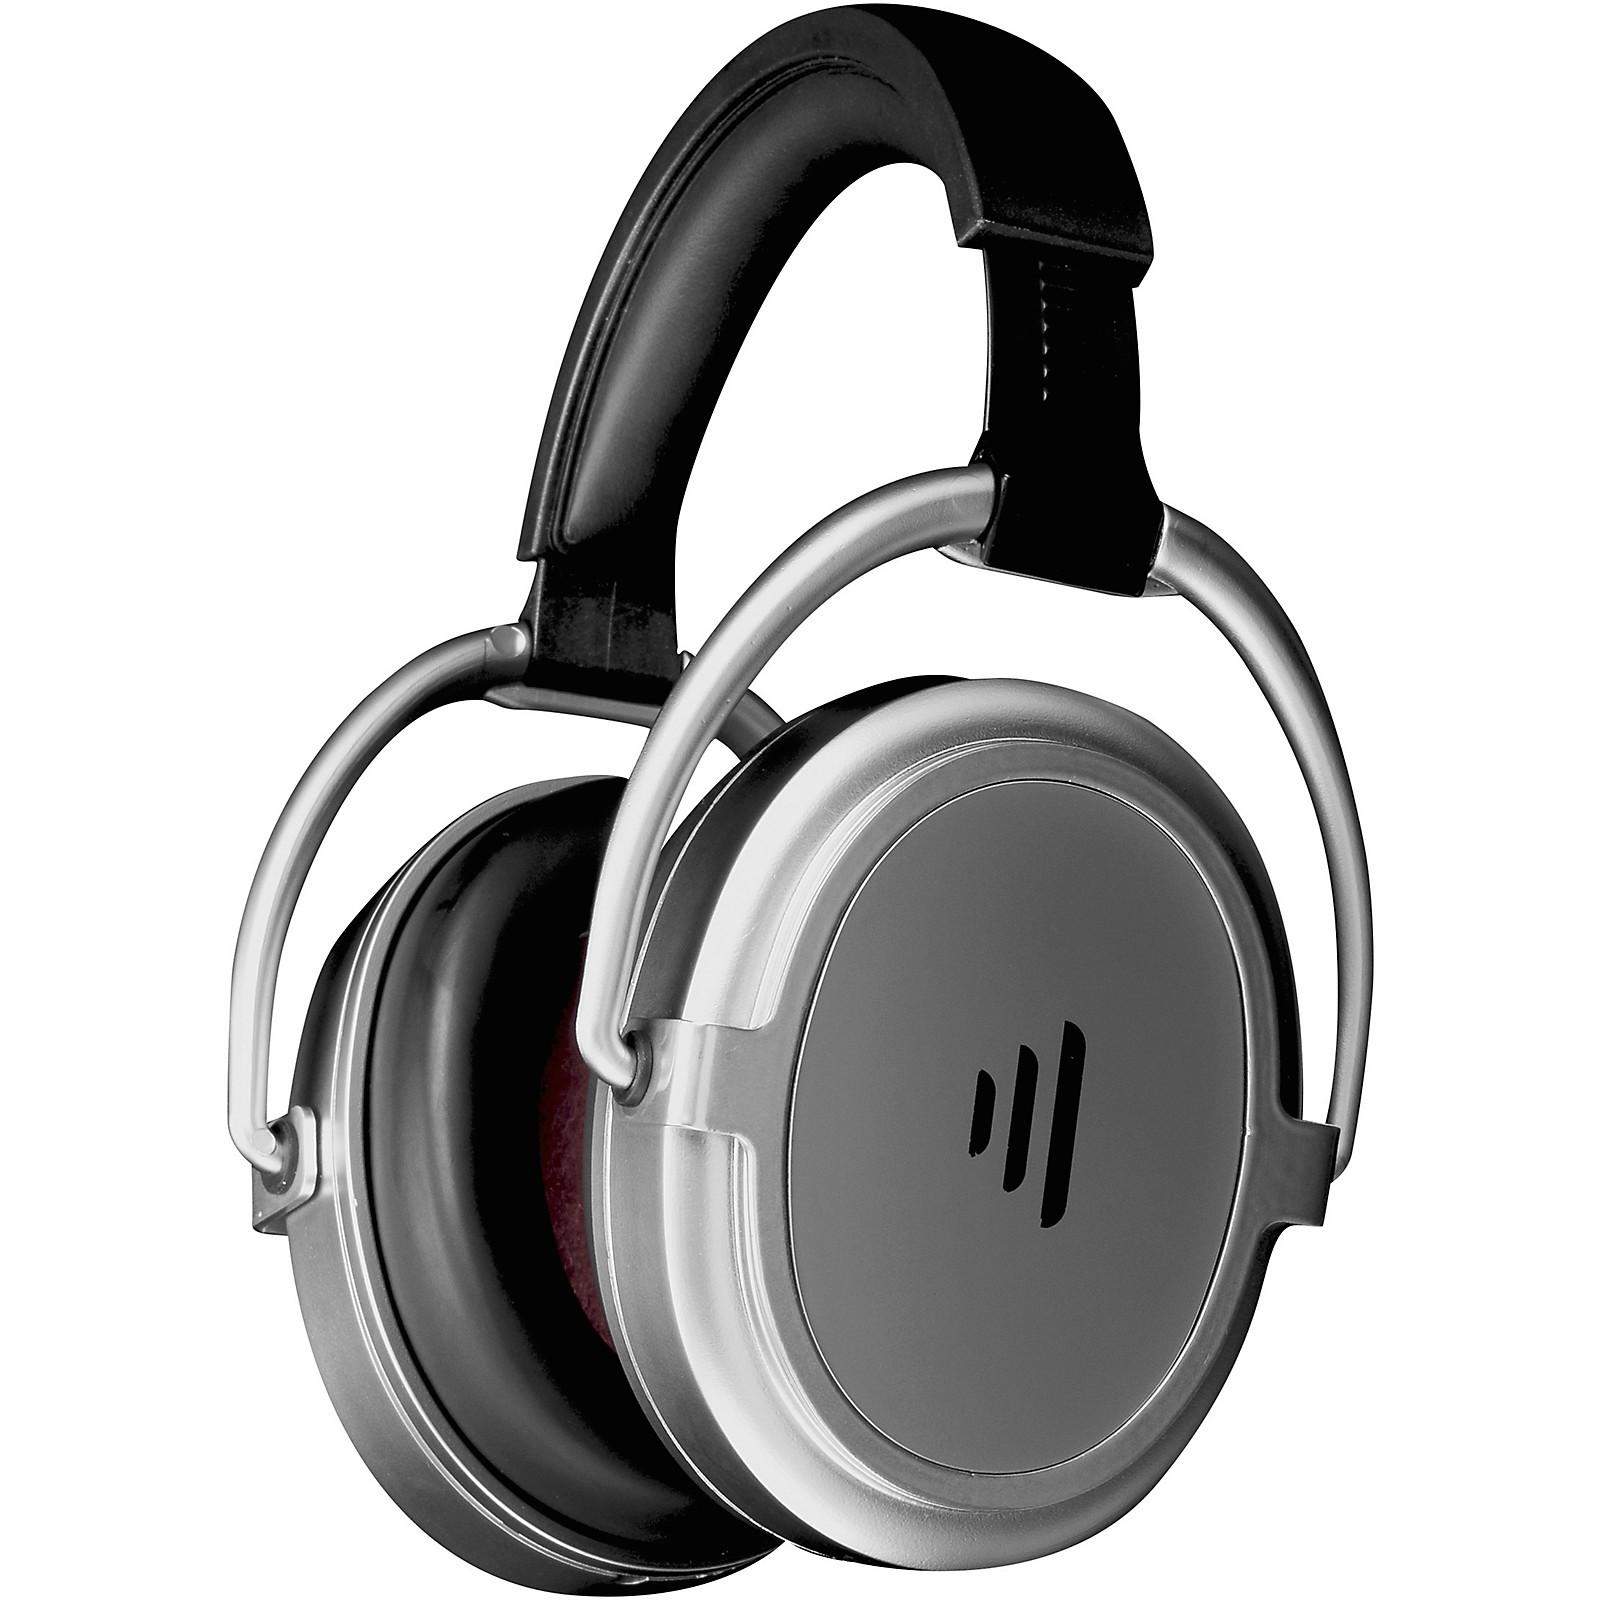 Direct Sound Serenity Plus+ Rechargable Luxury Travel Headphone Satin in Chrome Finish